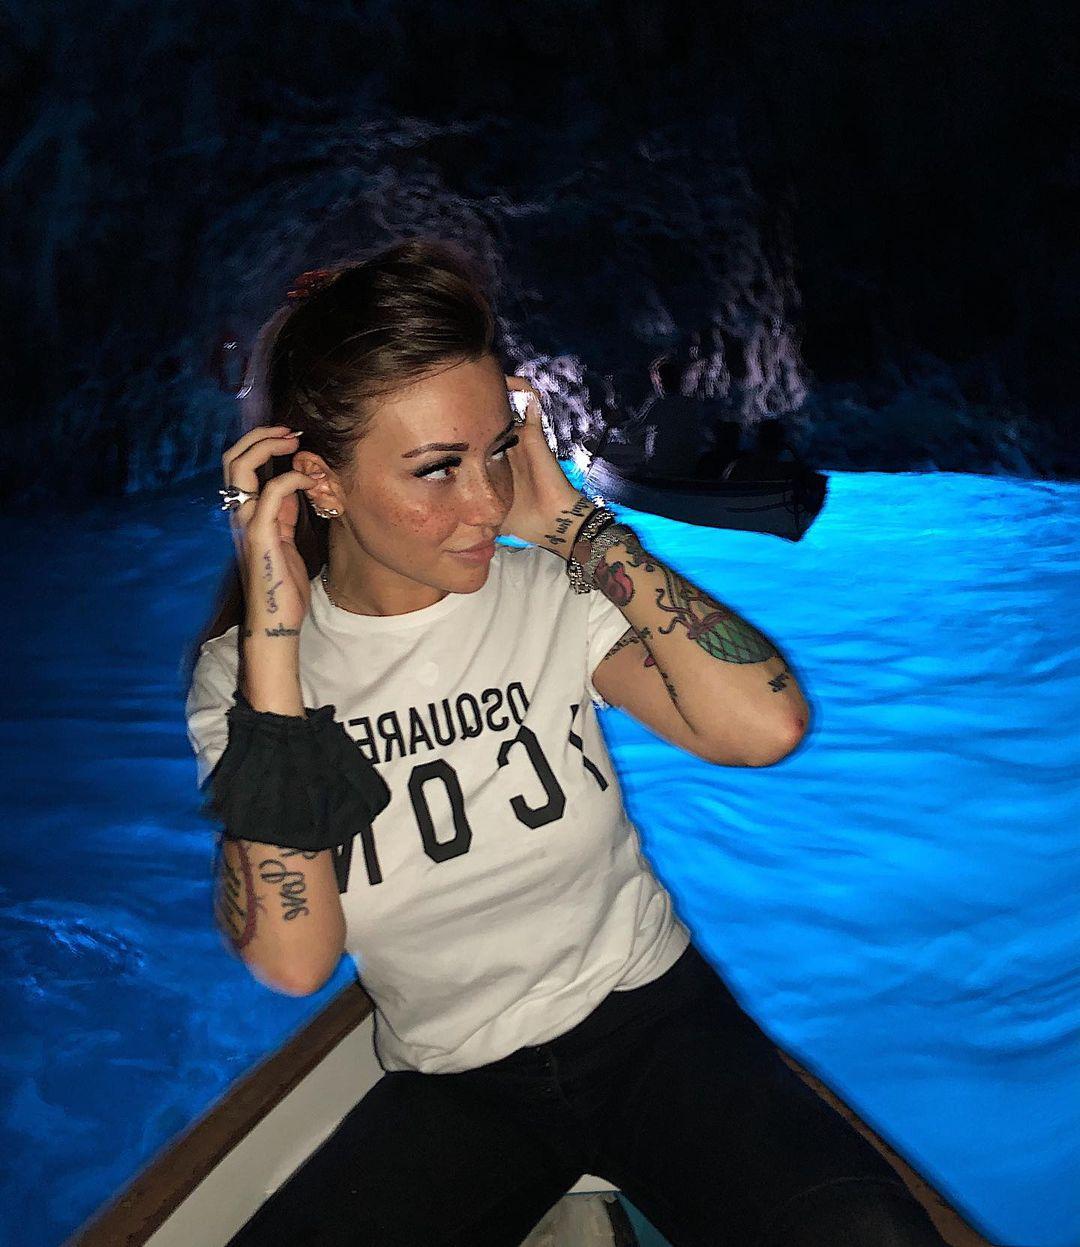 Francesca-Lannuario-Melillo-Wallpapers-Insta-Fit-Bio-12